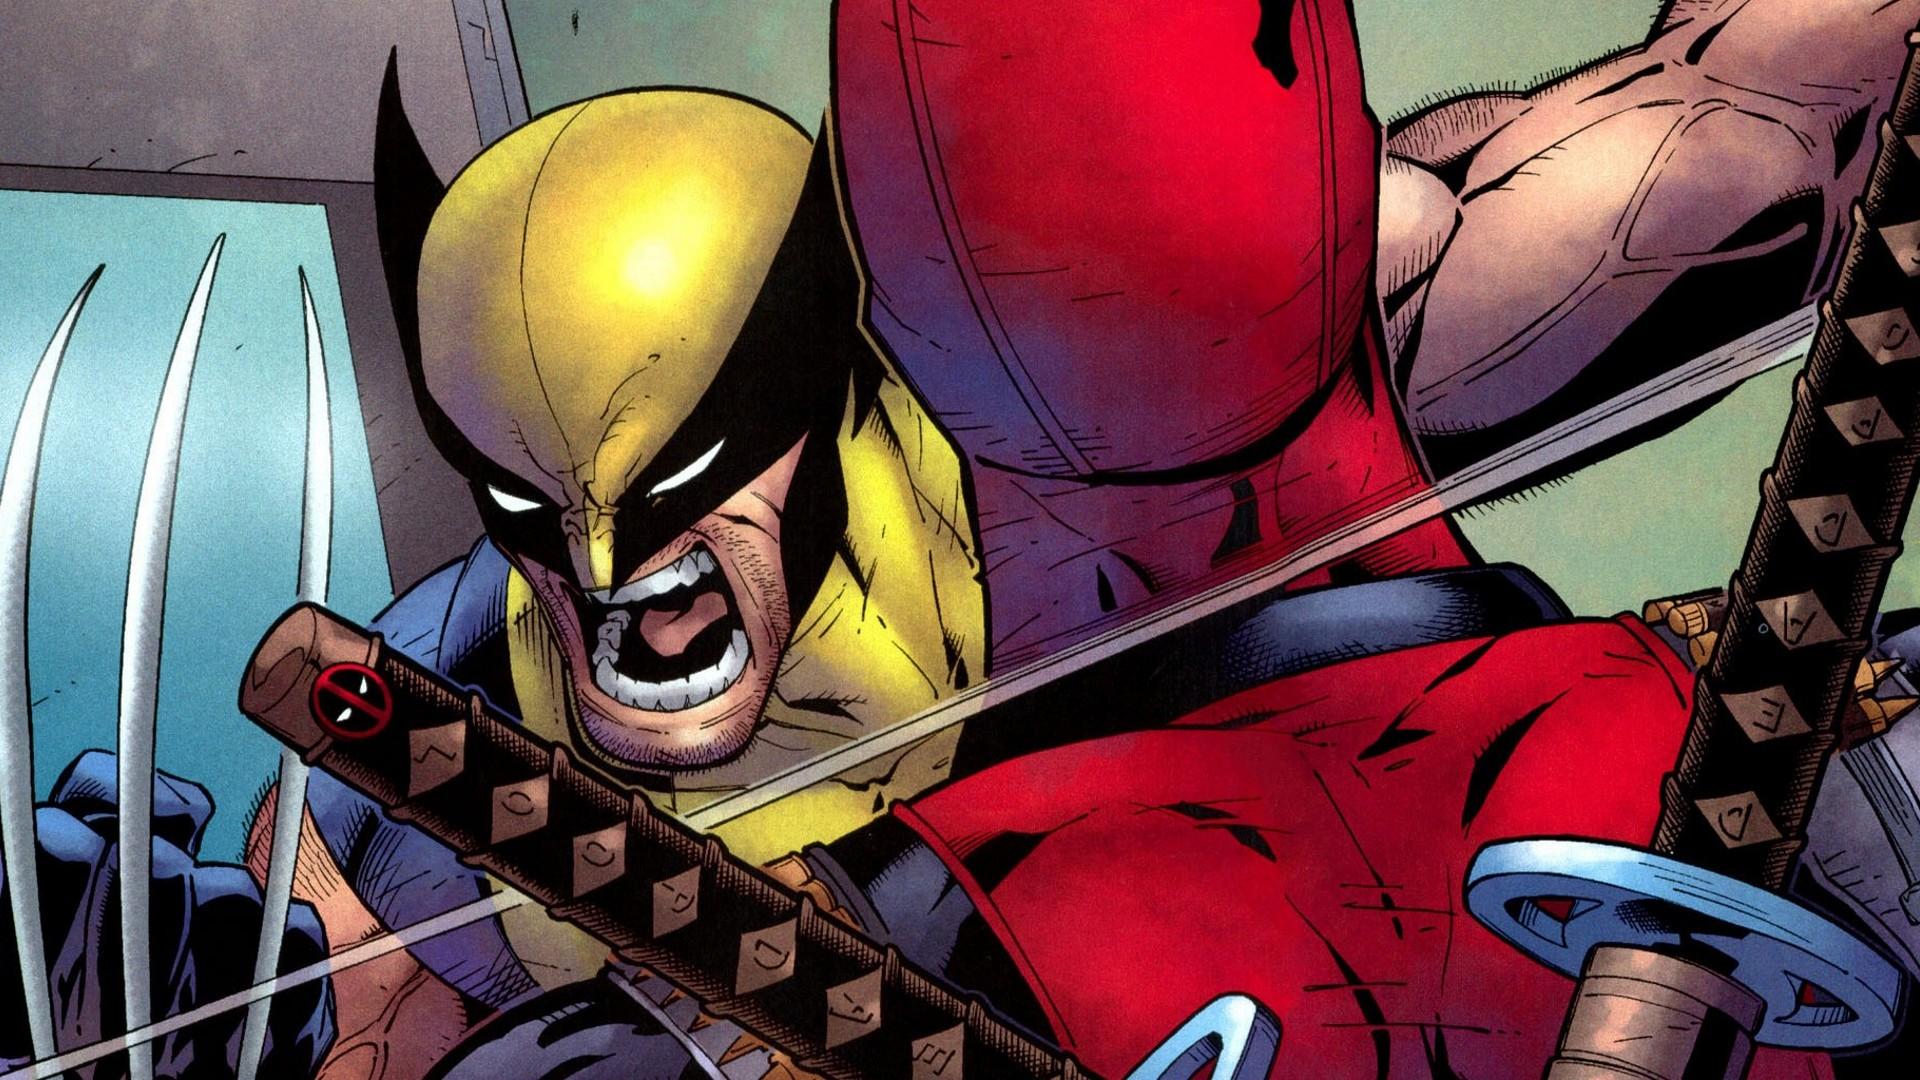 Res: 1920x1080, 3 X-Men Origins: Wolverine Vs Deadpool HD Wallpapers | Backgrounds -  Wallpaper Abyss